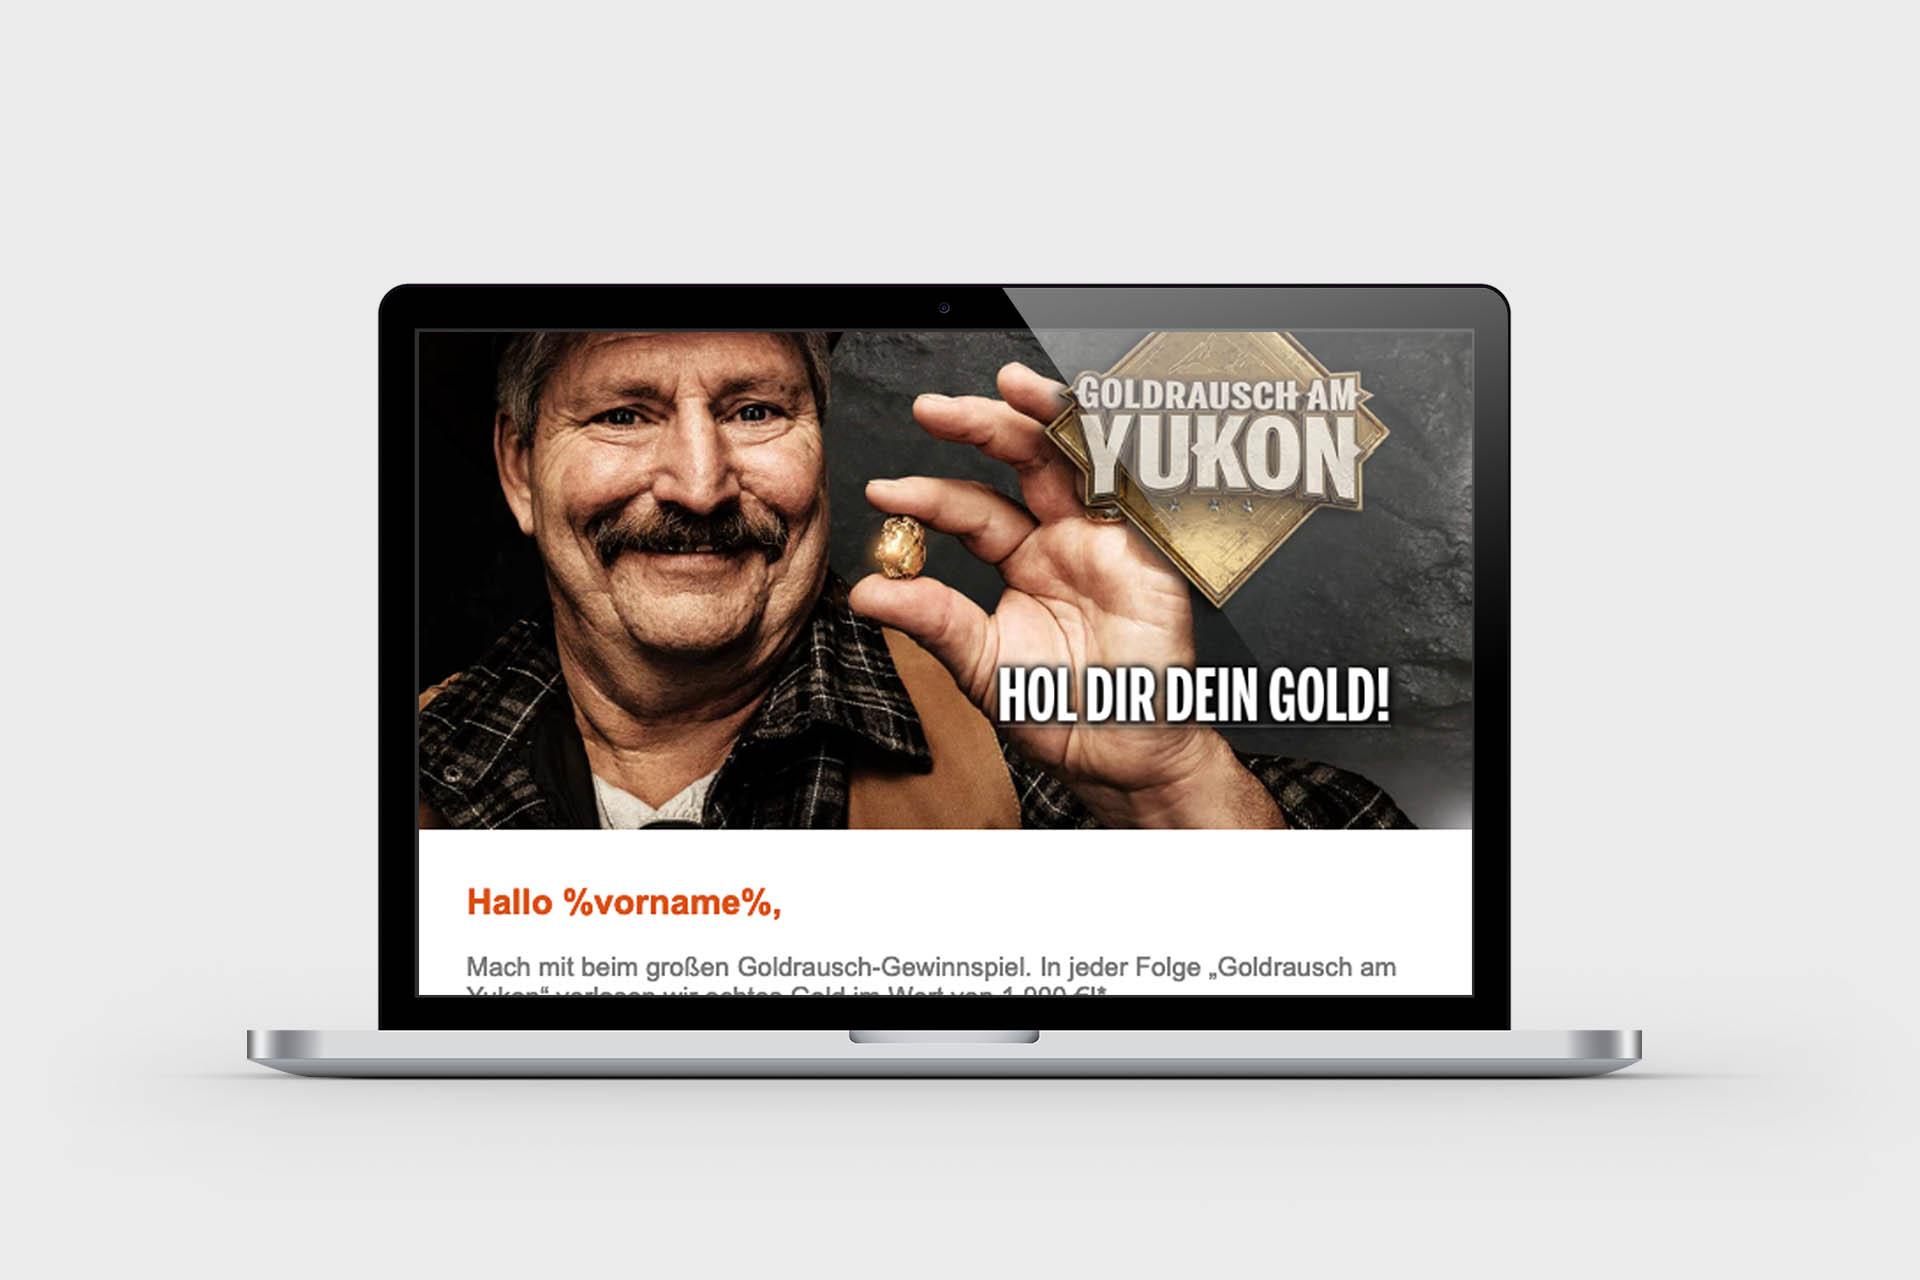 https://www.performance-werk.de/wp-content/uploads/2019/03/mockup_dmax1.jpg